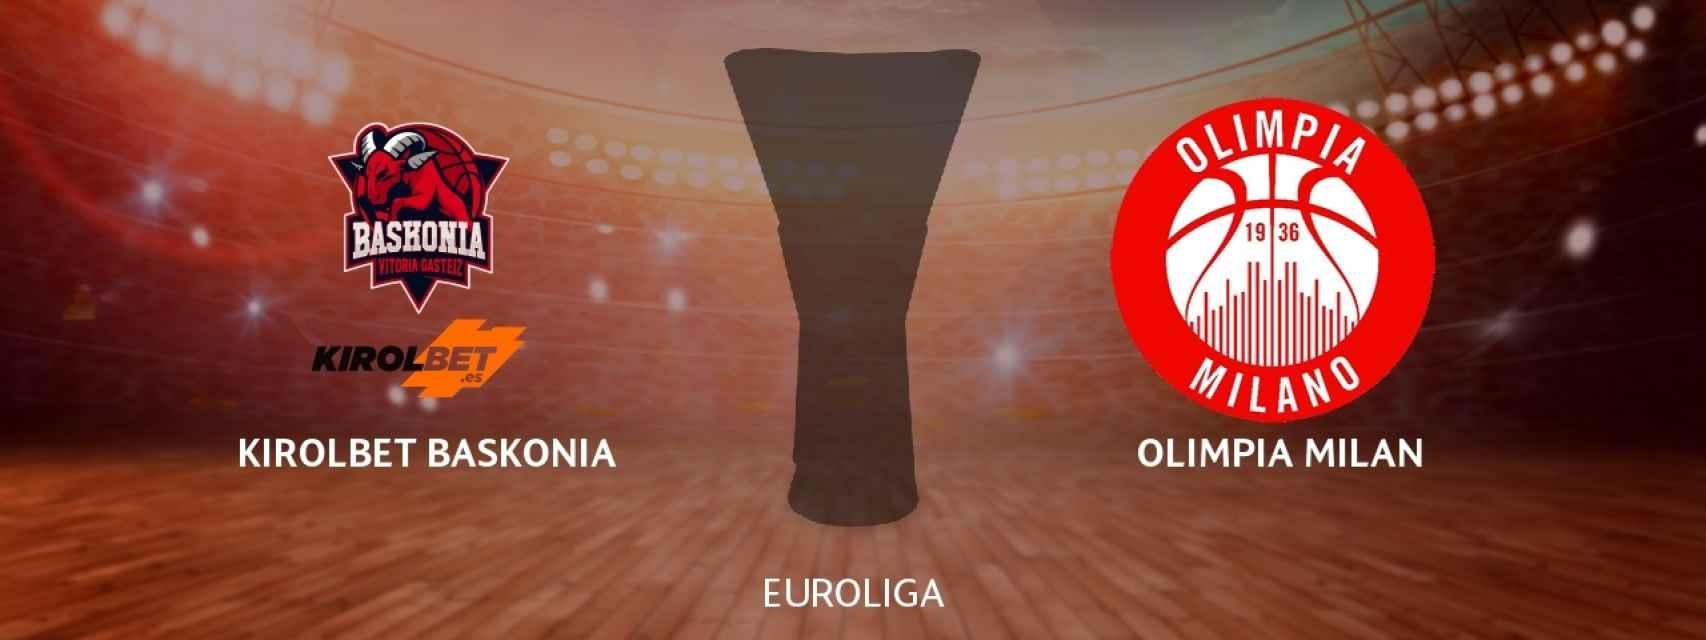 Kirolbet Baskonia - Olimpia Milan